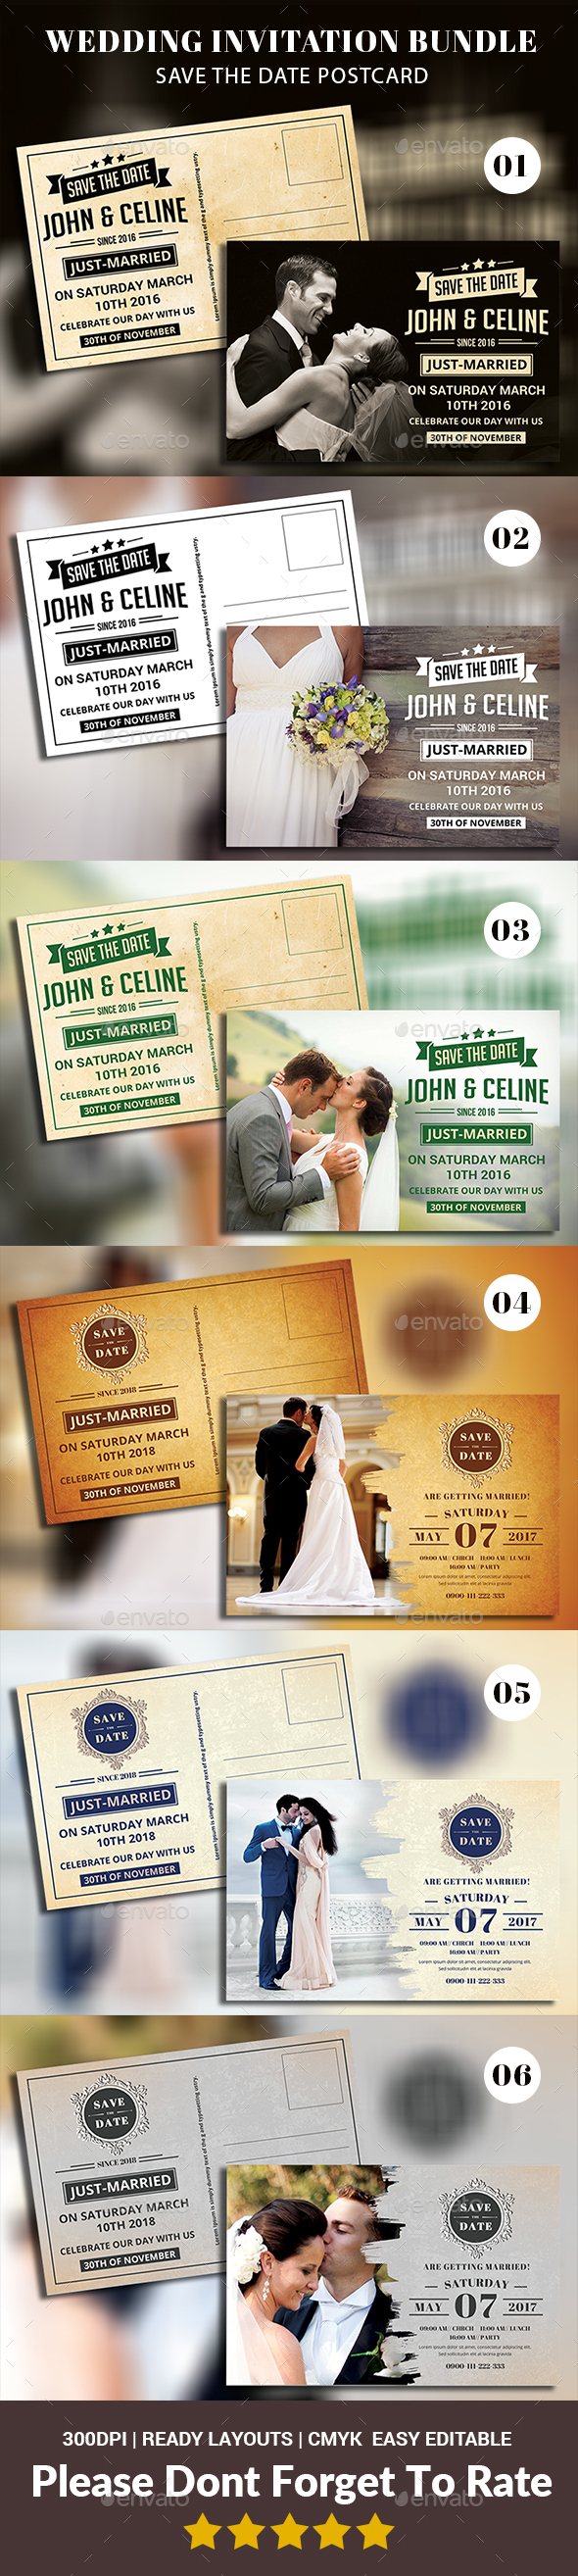 Save The Date Postcard Bundle Templates - Weddings Cards & Invites